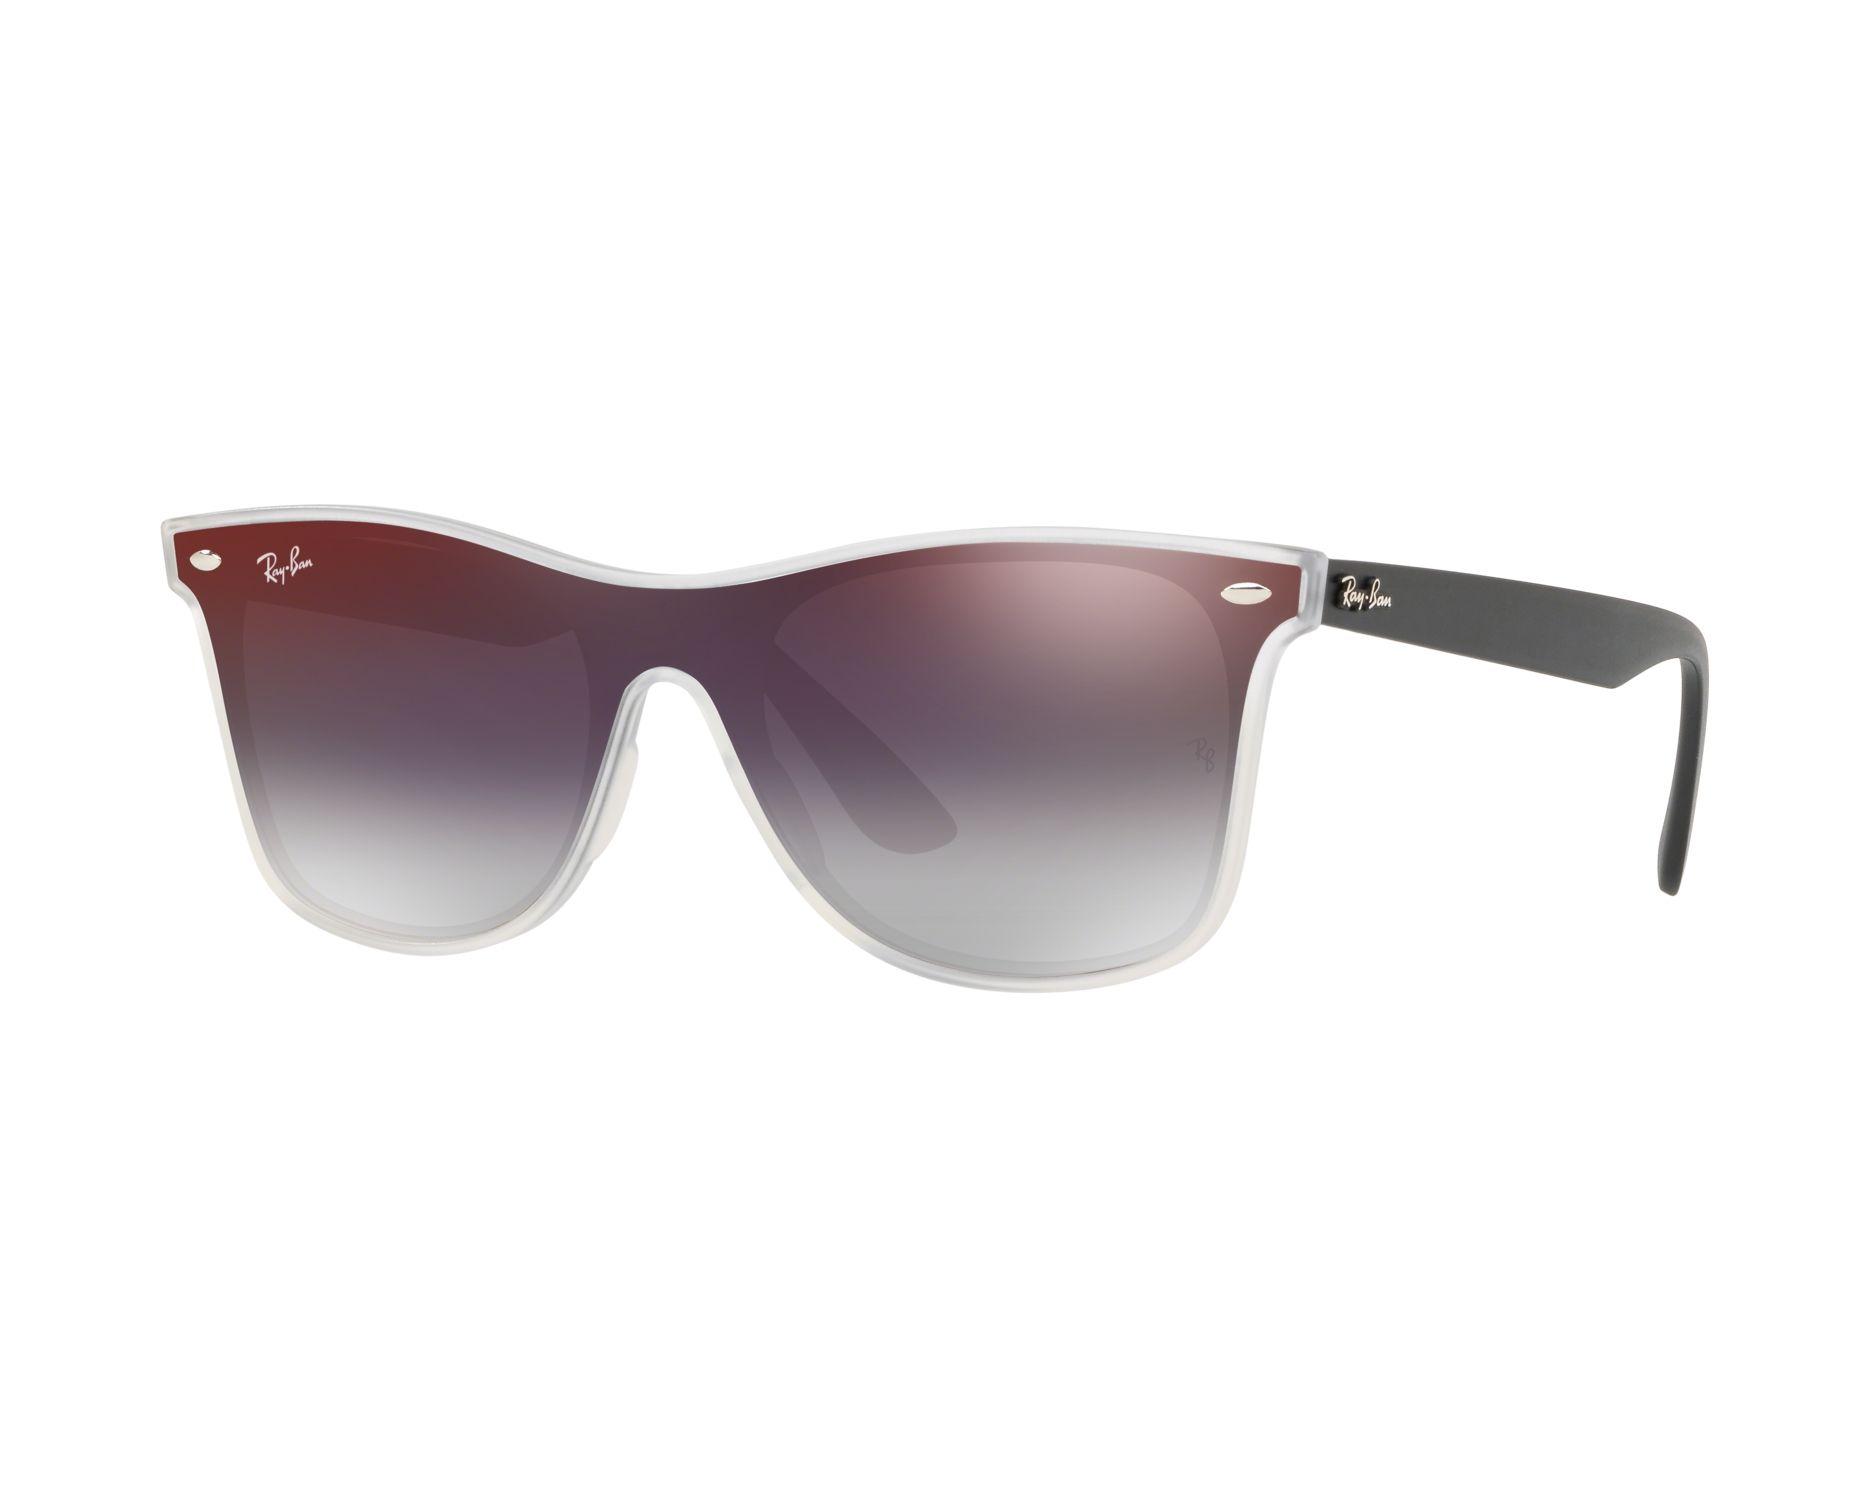 37549318401 Sunglasses Ray-Ban RB-4440-N 6355U0 55-18 Crystal Black